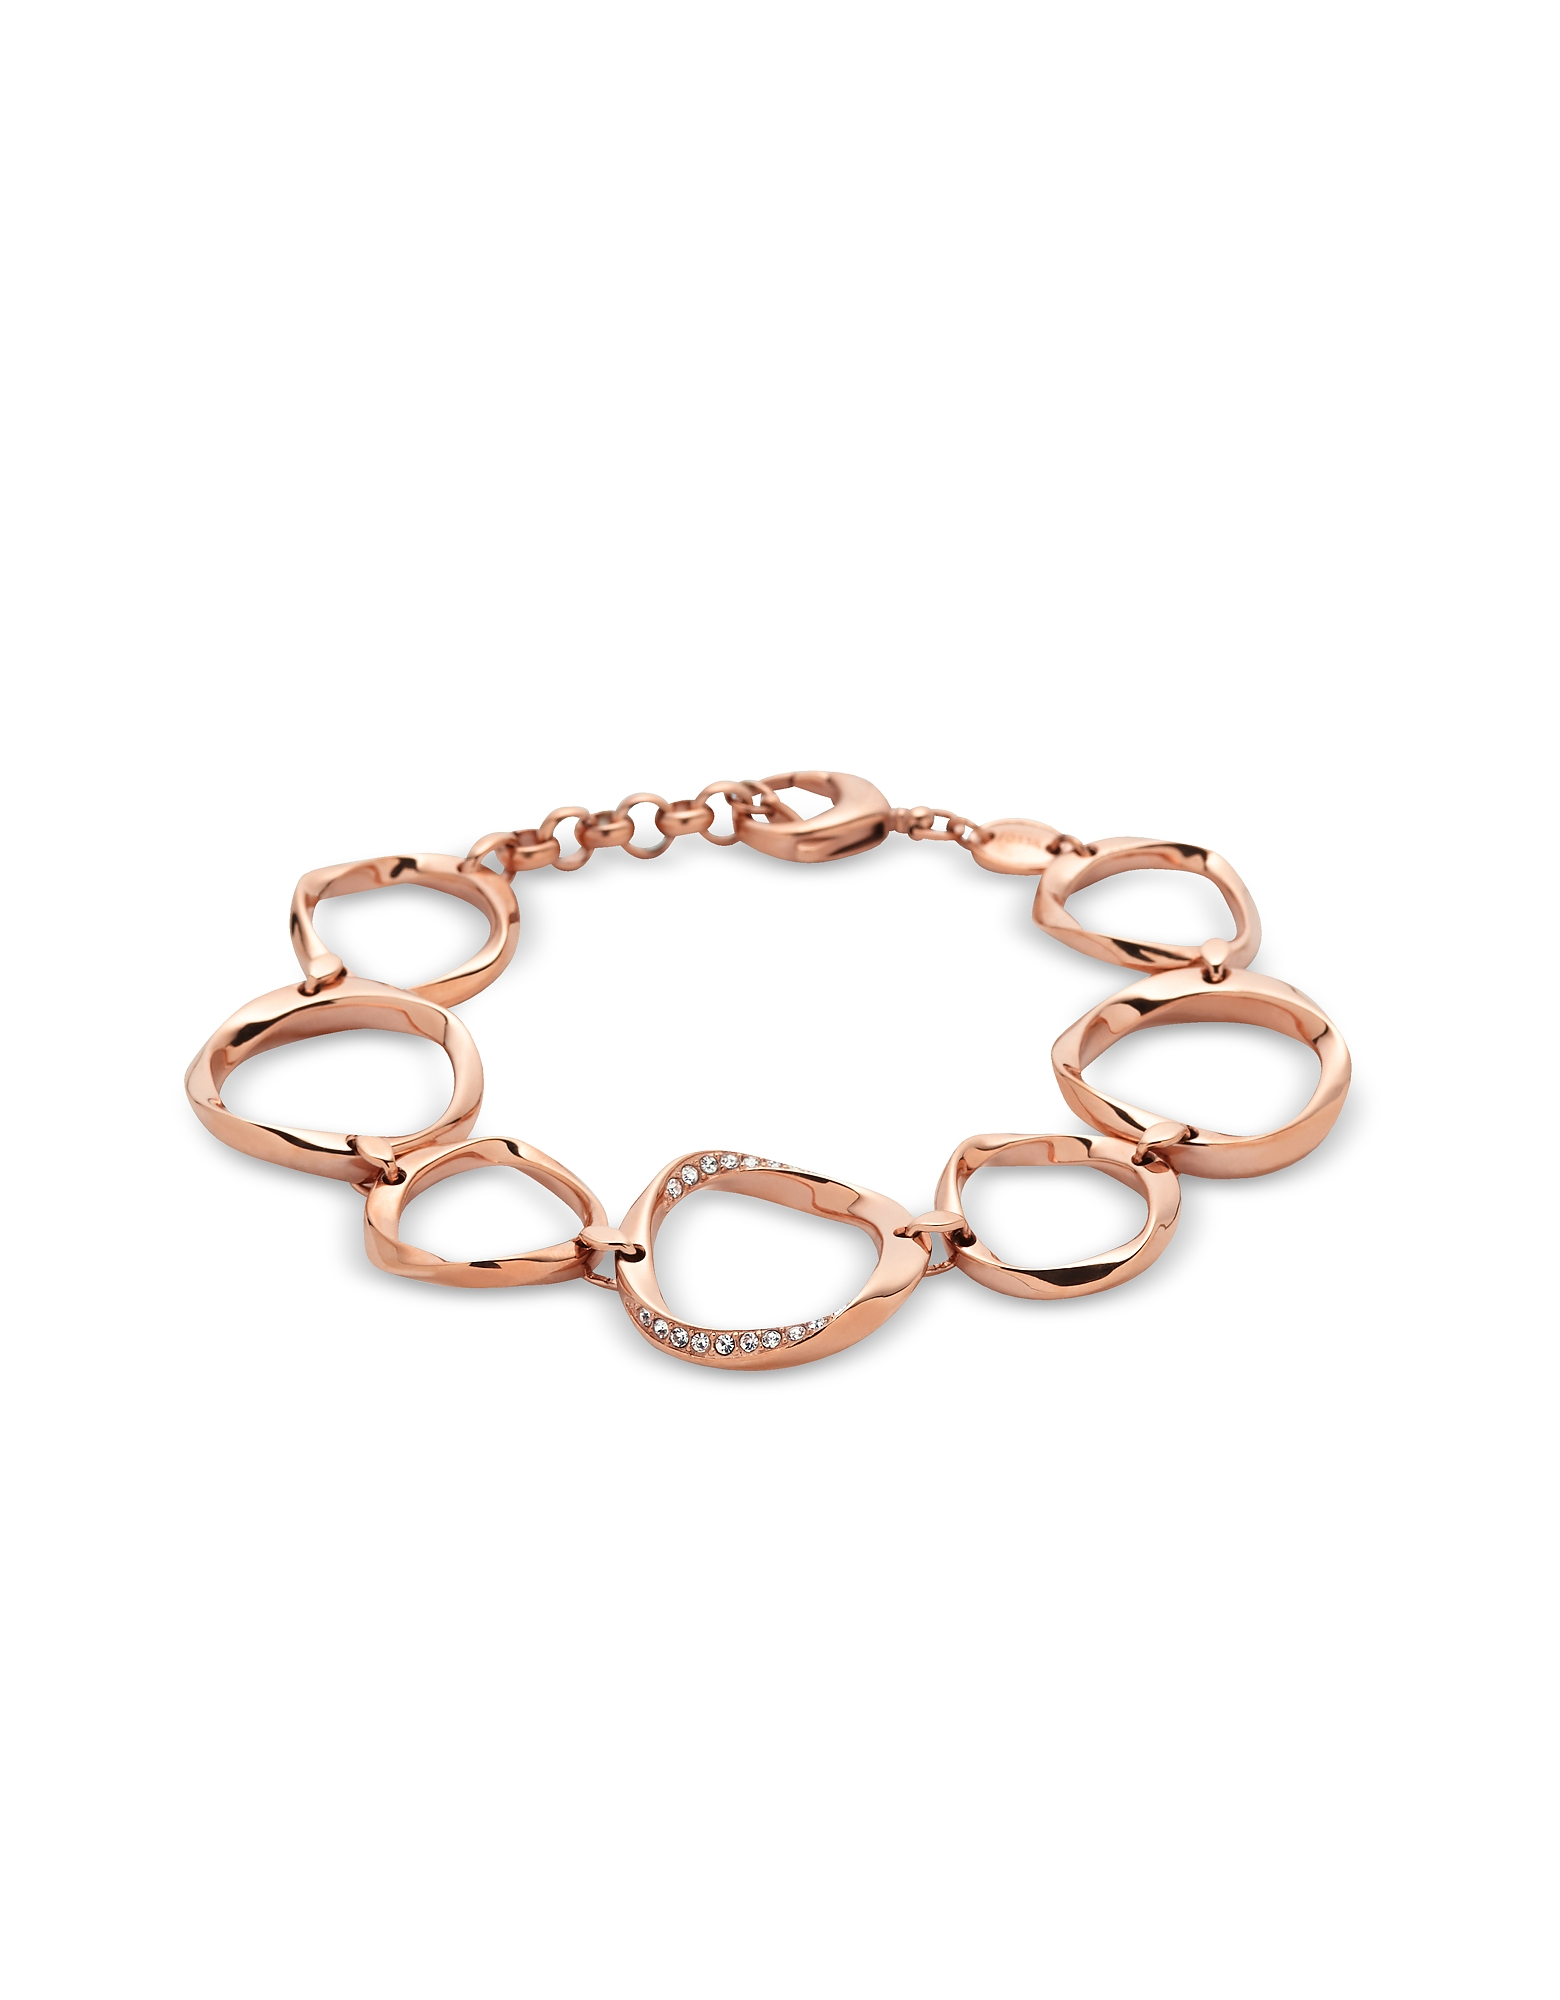 Fossil Bracelets, Circle Rose Gold Women's Bracelet